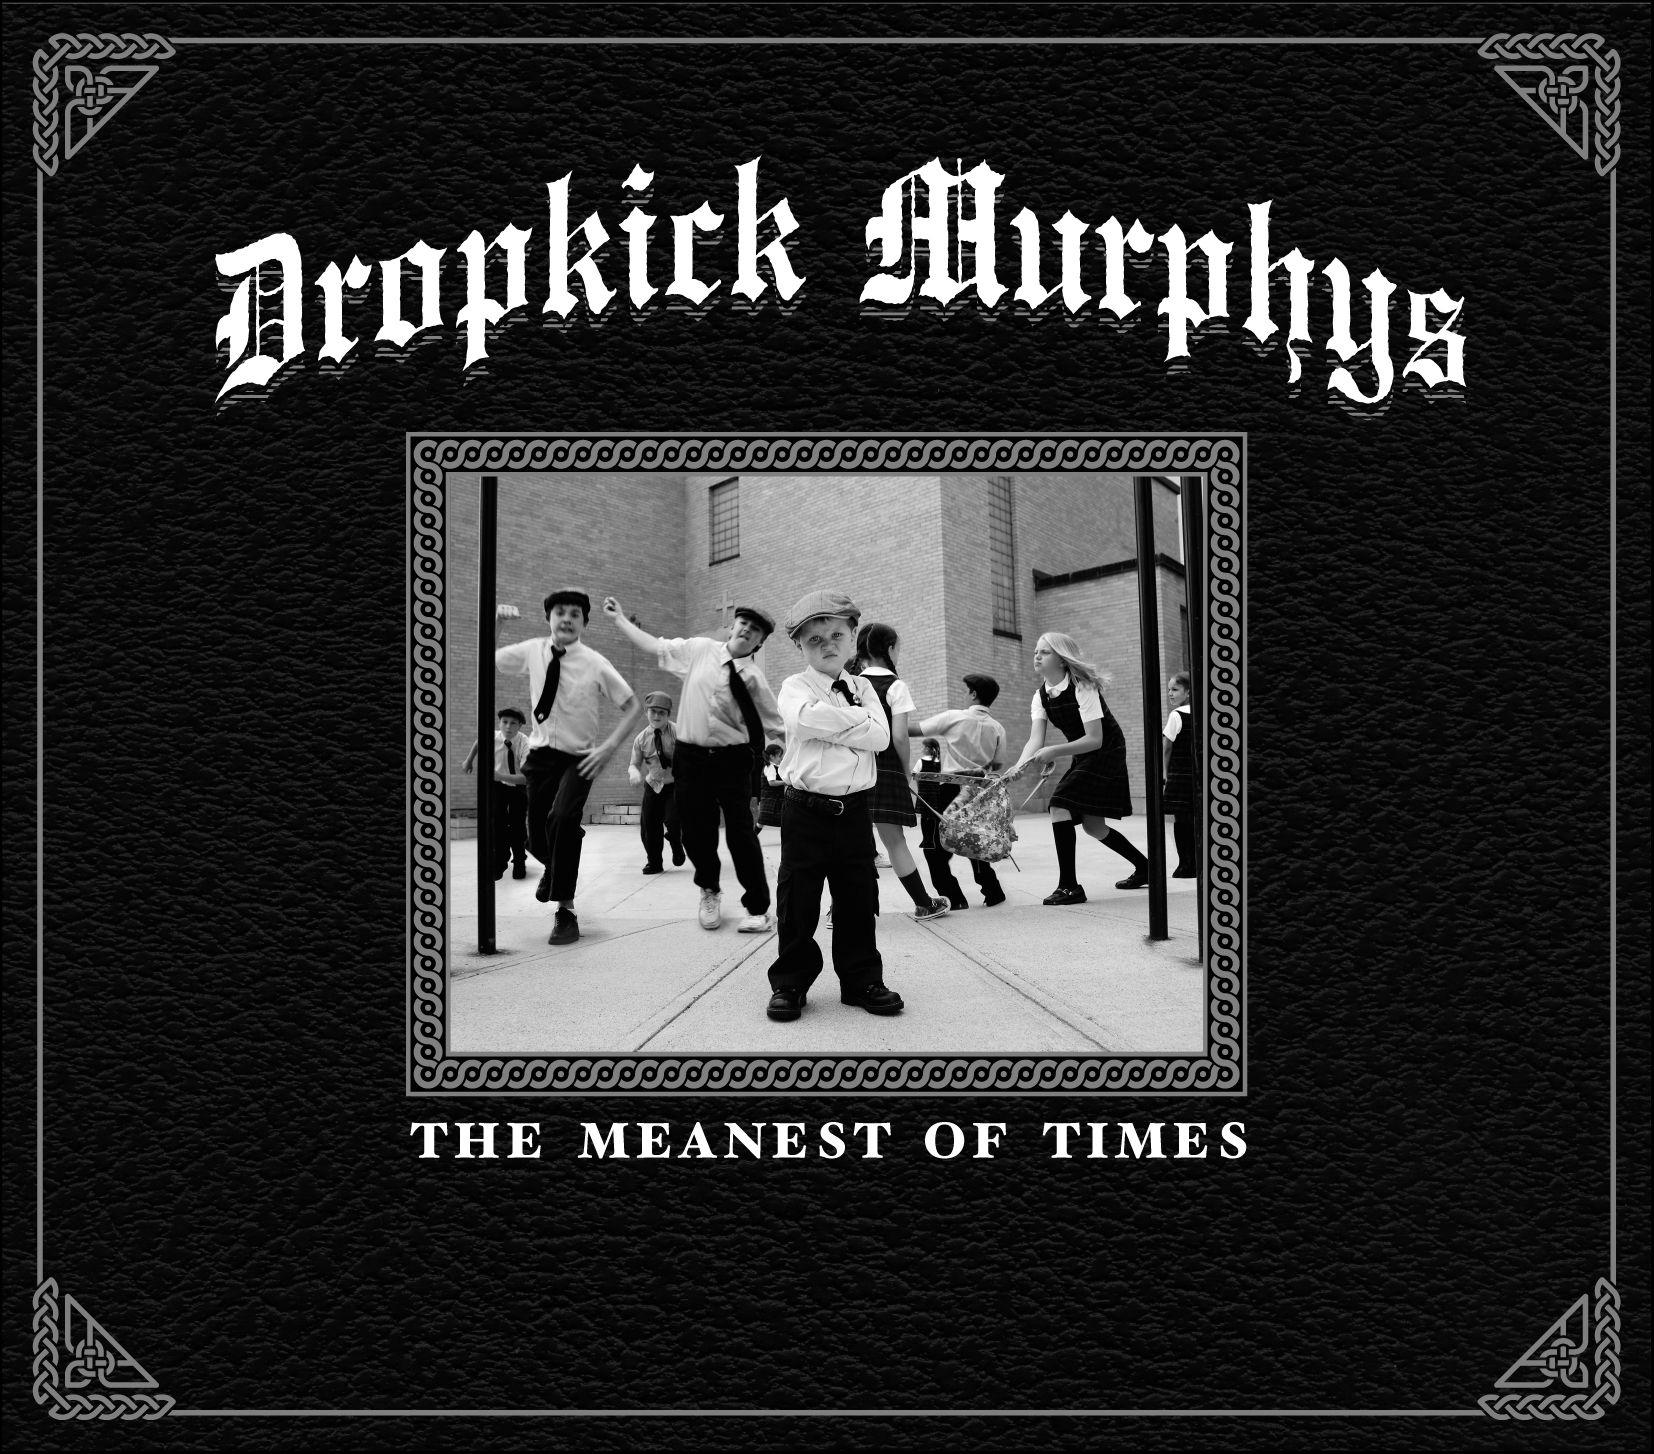 Dropkick Murphys - The Meanest Of Times album cover